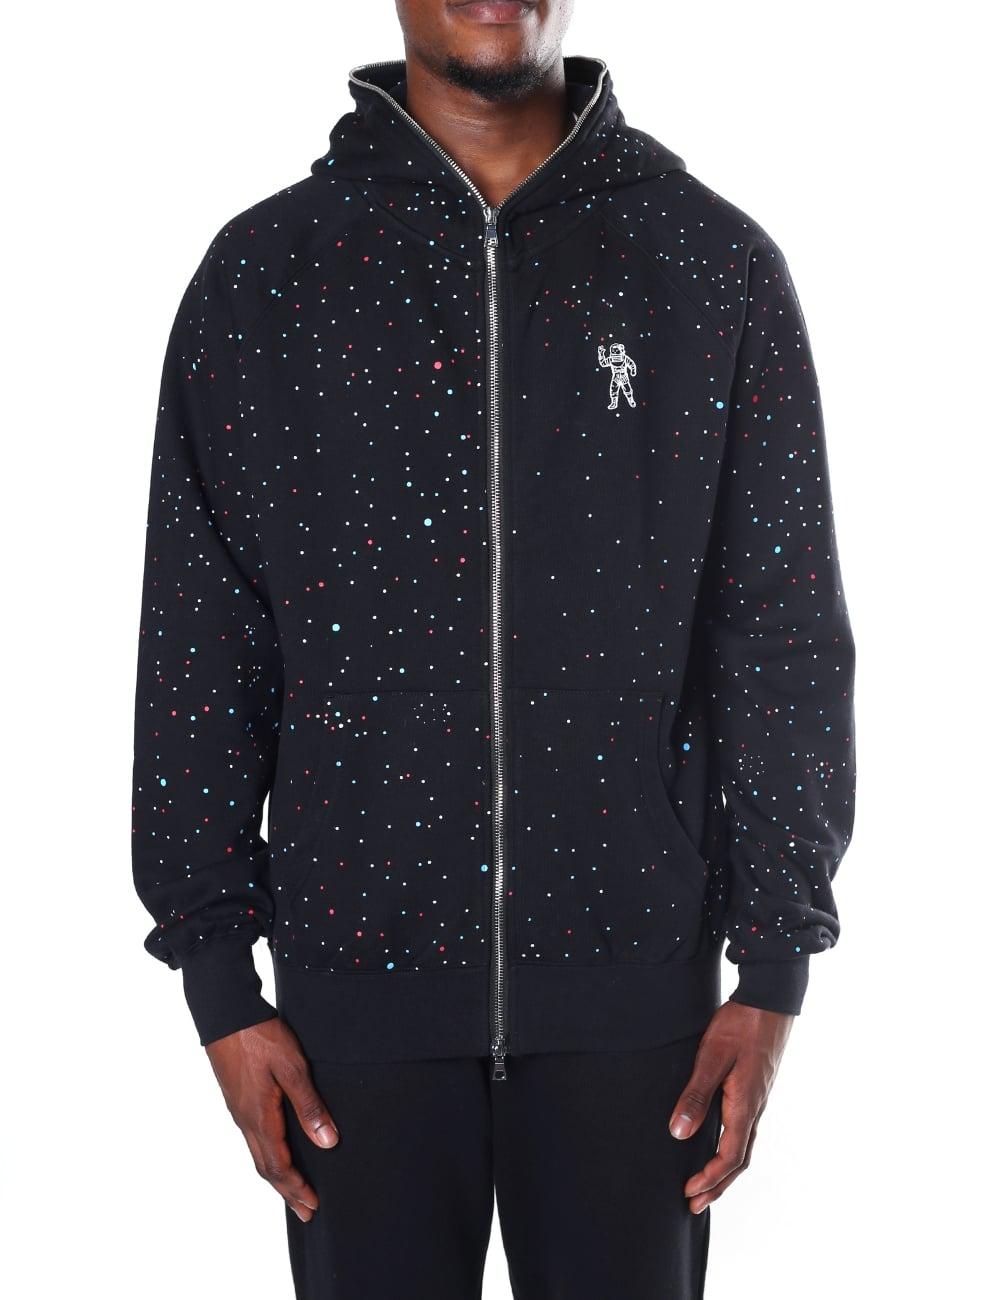 d1ba26d36d4e Billionaire Boys Club Men s Galaxy Astro Full Zip Hoody